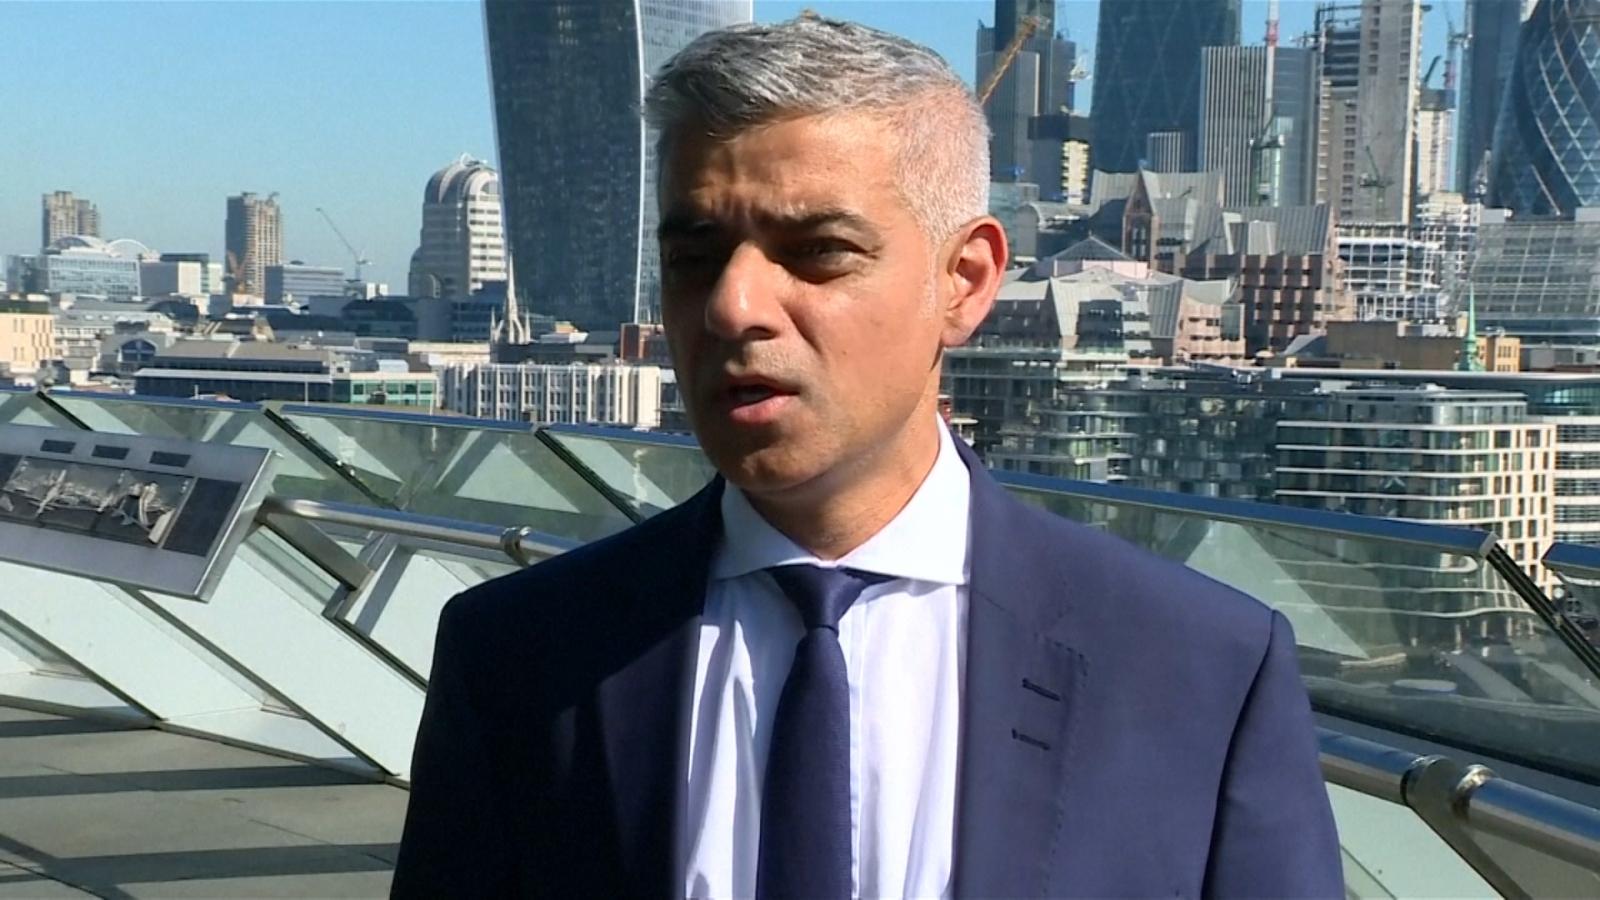 Sadiq Khan Urges Londoners To Be 'Calm But Vigilant' After Finsbury Park Mosque Attack